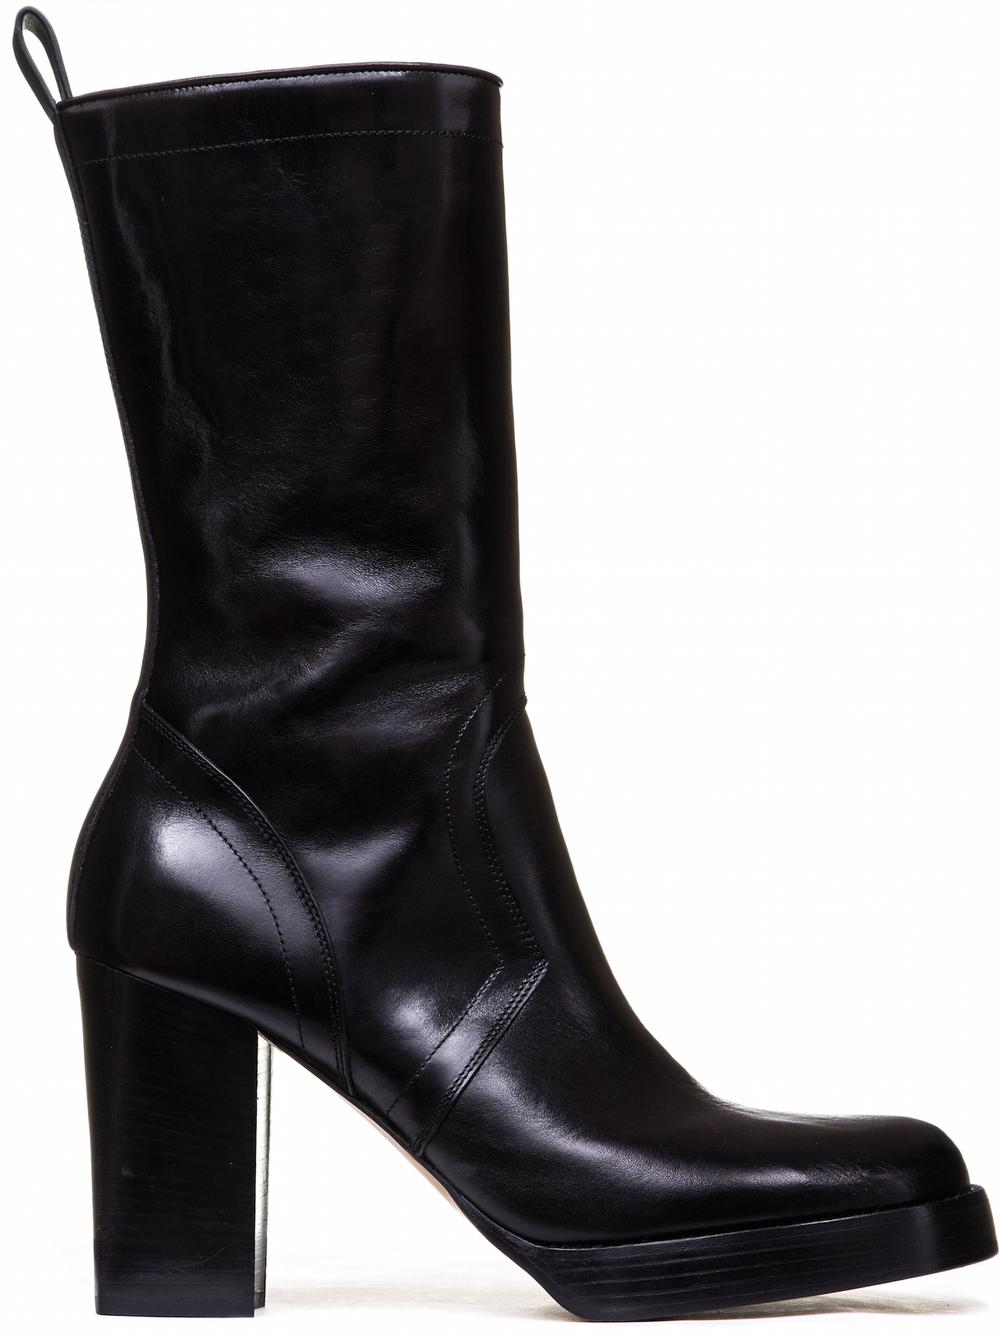 Rick Owens 'Glitter Chunky' boots